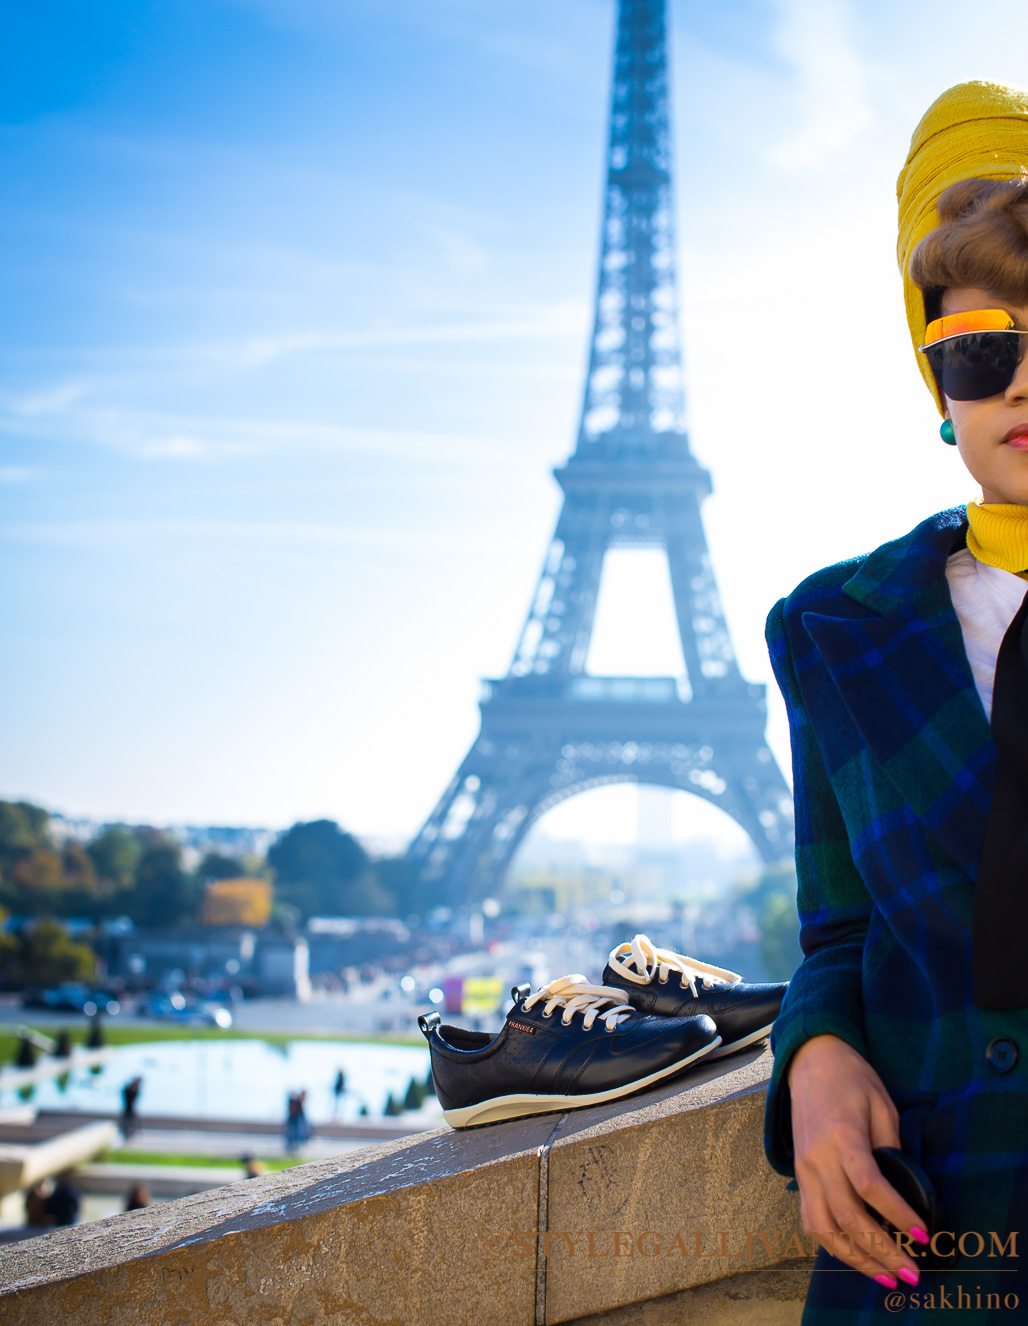 Elegant Luxurious Sneakers, othortic-sneakers_frankie4-shoes_stylish-orthotic-shoes_top-5-stylish-sneakers_trendy-black-sneakers_style-gallivanter_miranda-sakhino_top-best-australian-fashion-blogs-2017-2016-4